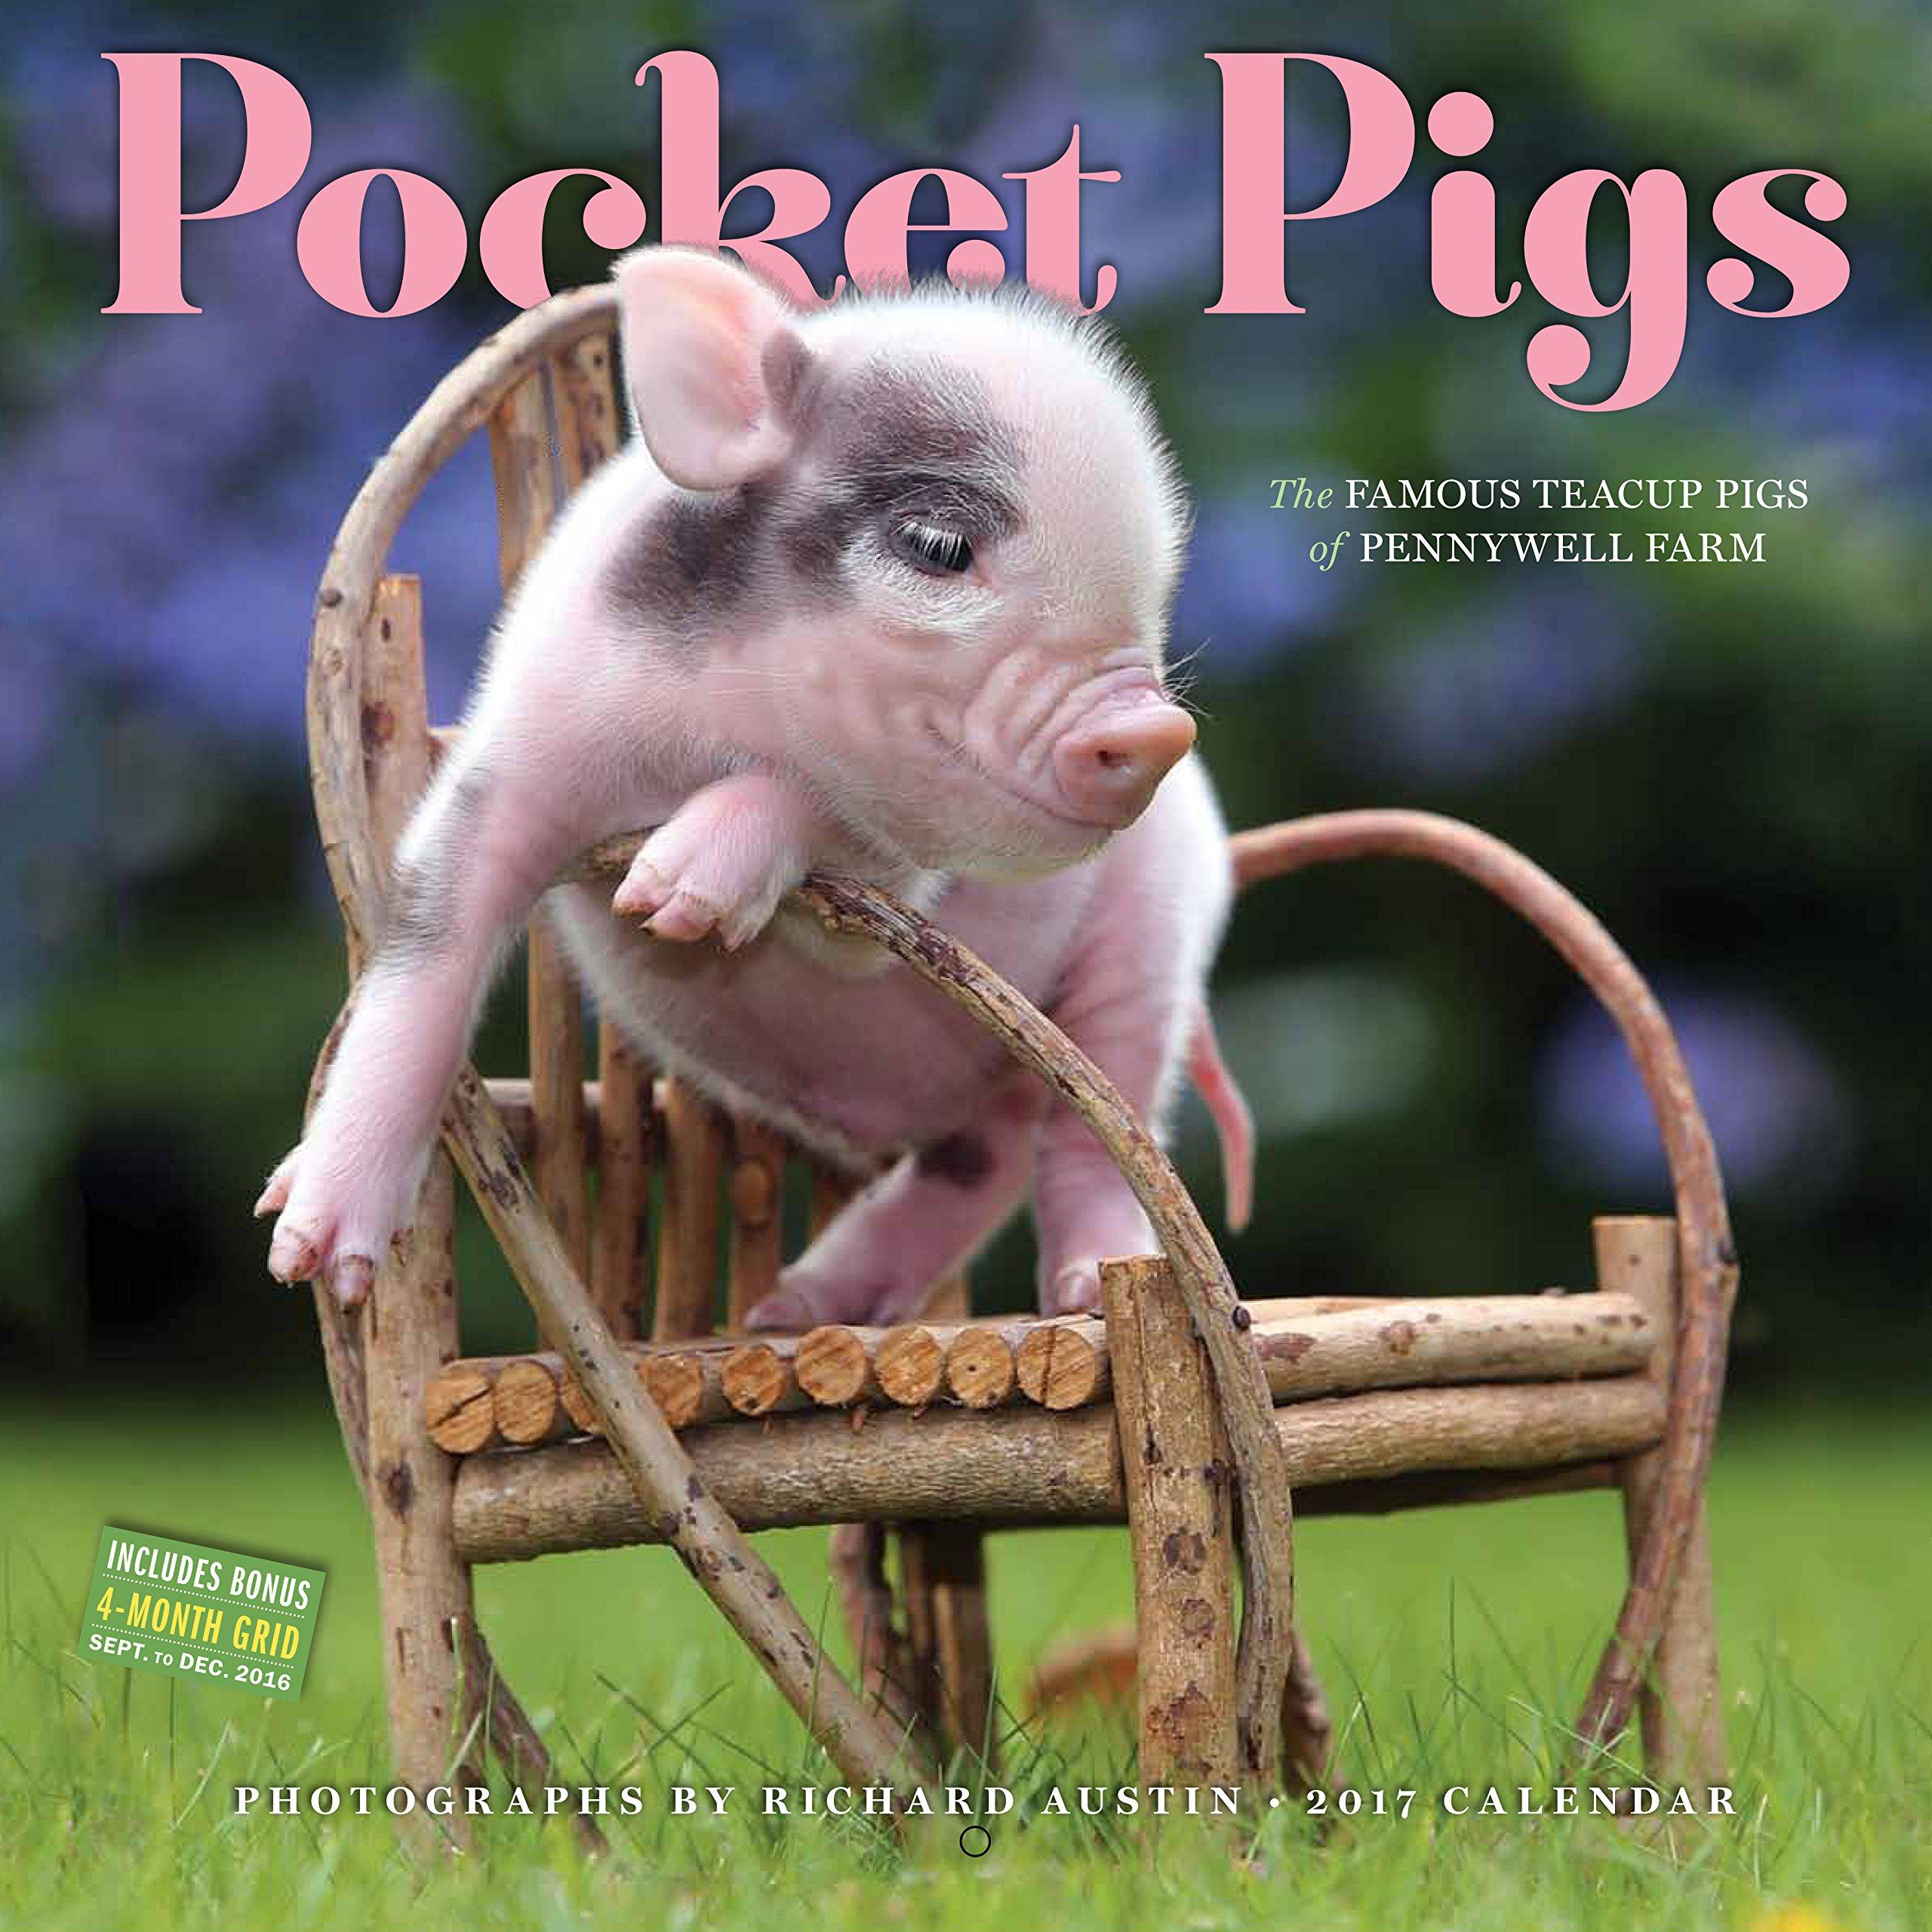 Pocket pigs wall calendar 2017 the famous teacup pigs of pennywell pocket pigs wall calendar 2017 the famous teacup pigs of pennywell farm workman publishing richard austin 9780761188049 amazon books voltagebd Choice Image